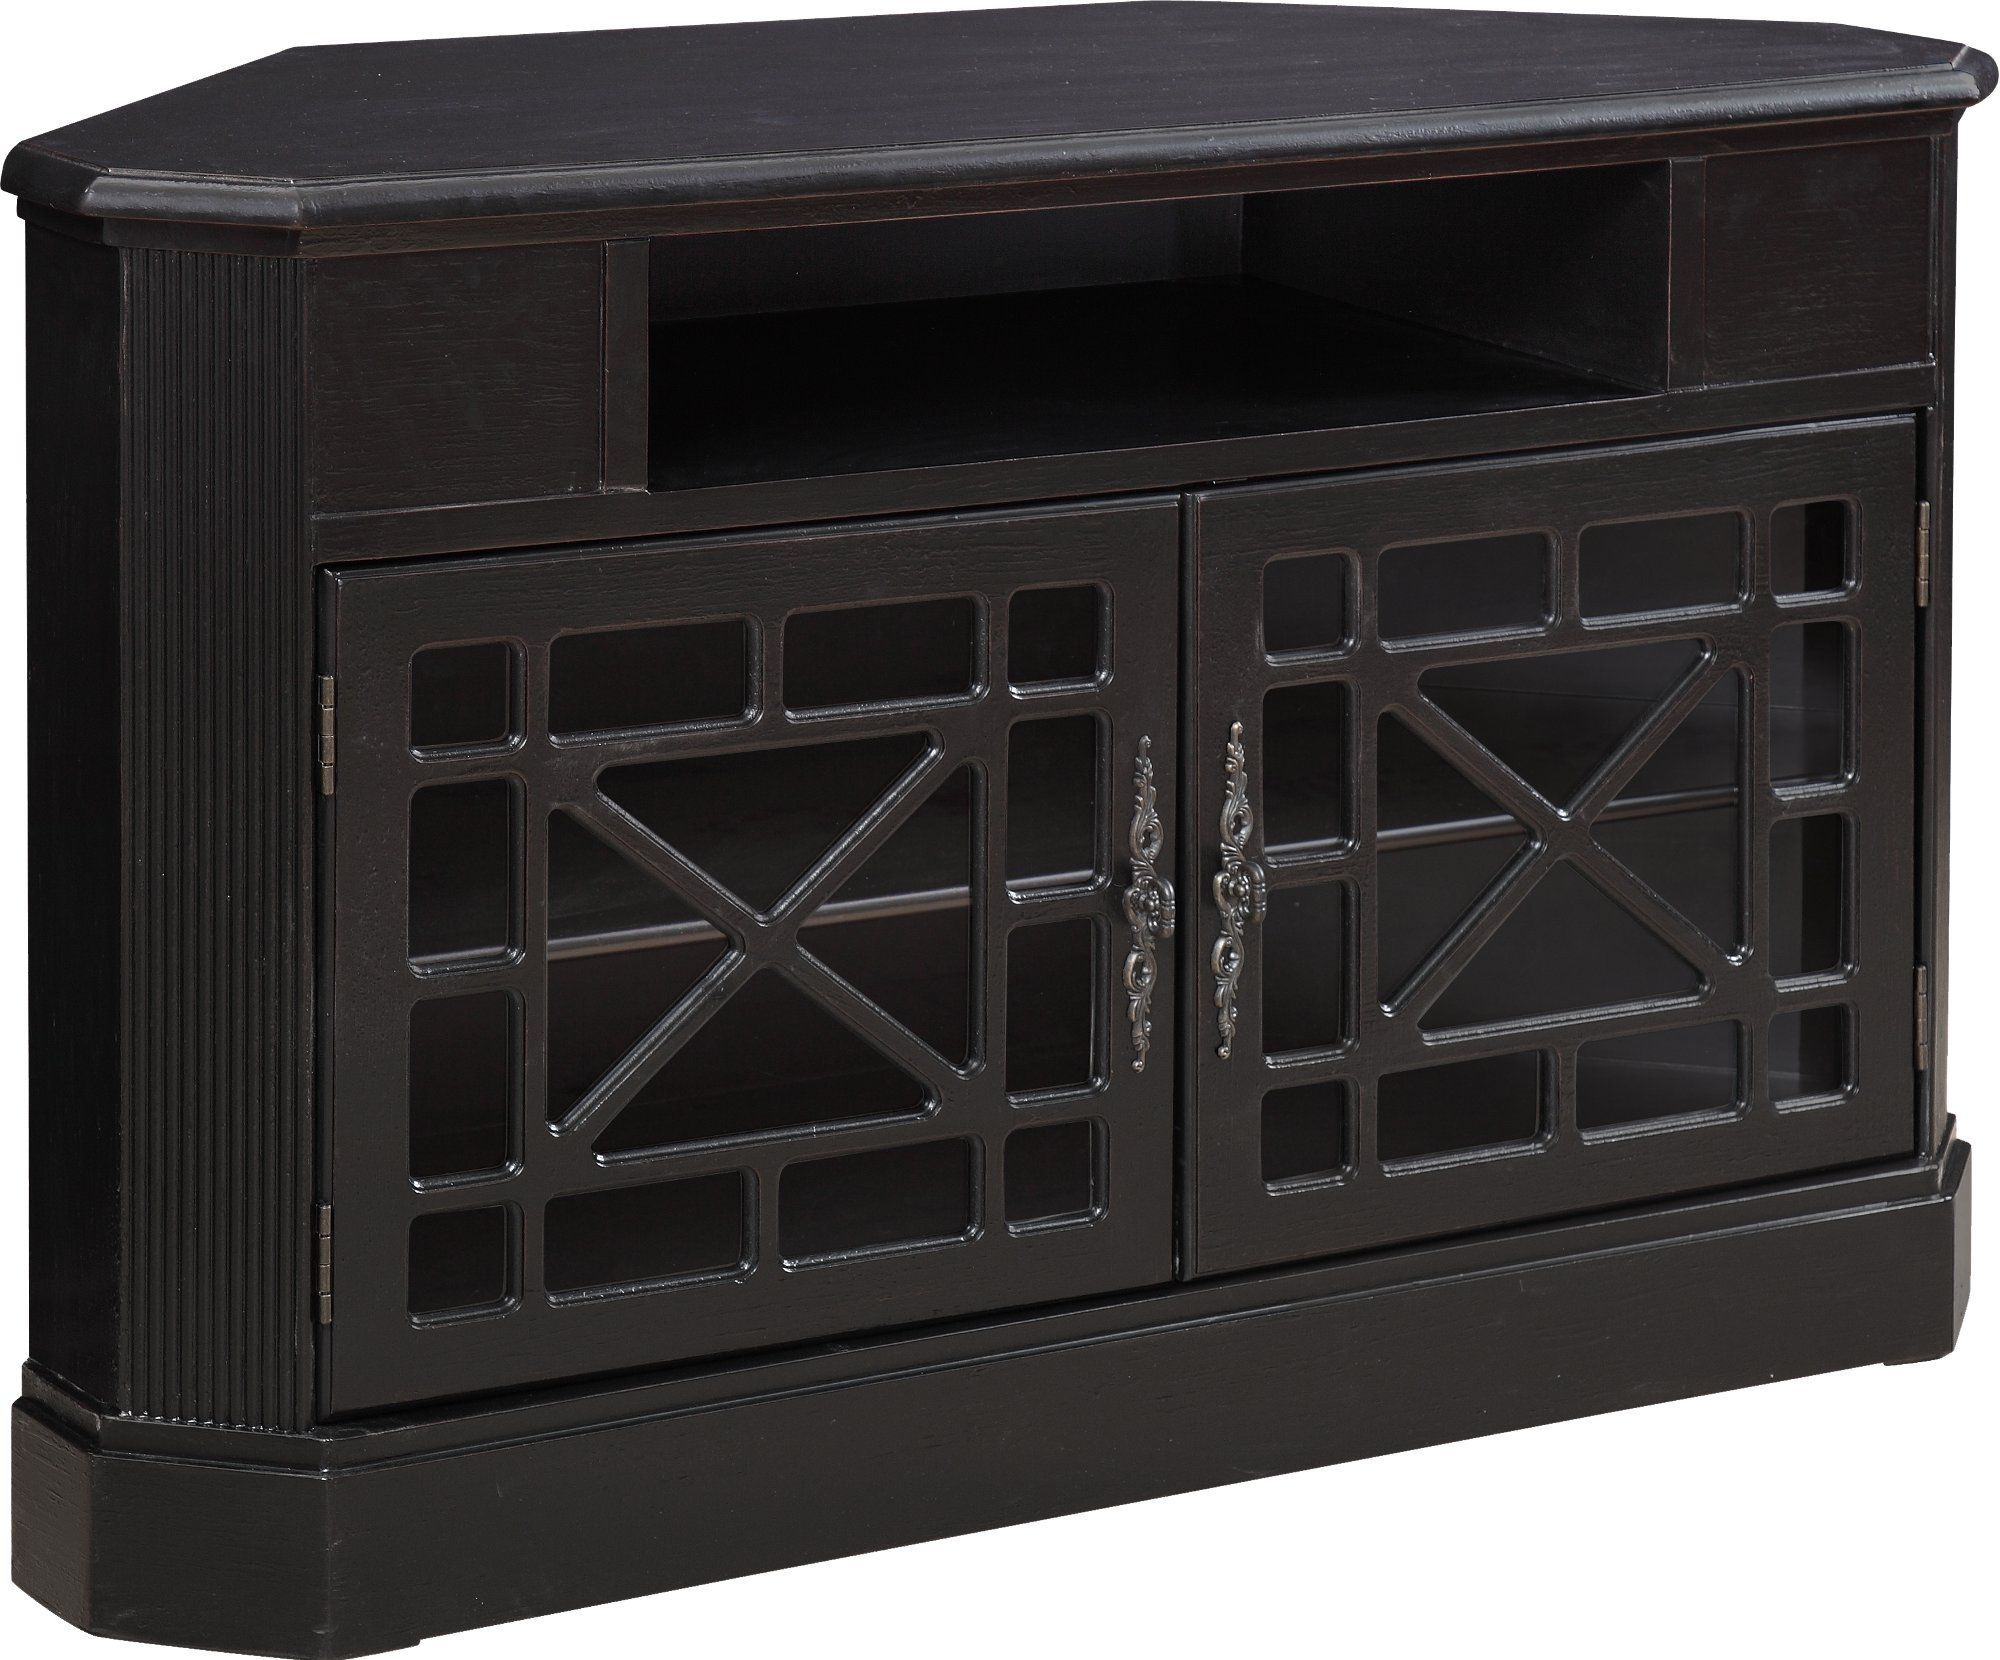 50 Inch Textured Black Corner Tv Stand In 2020 Black Corner Tv